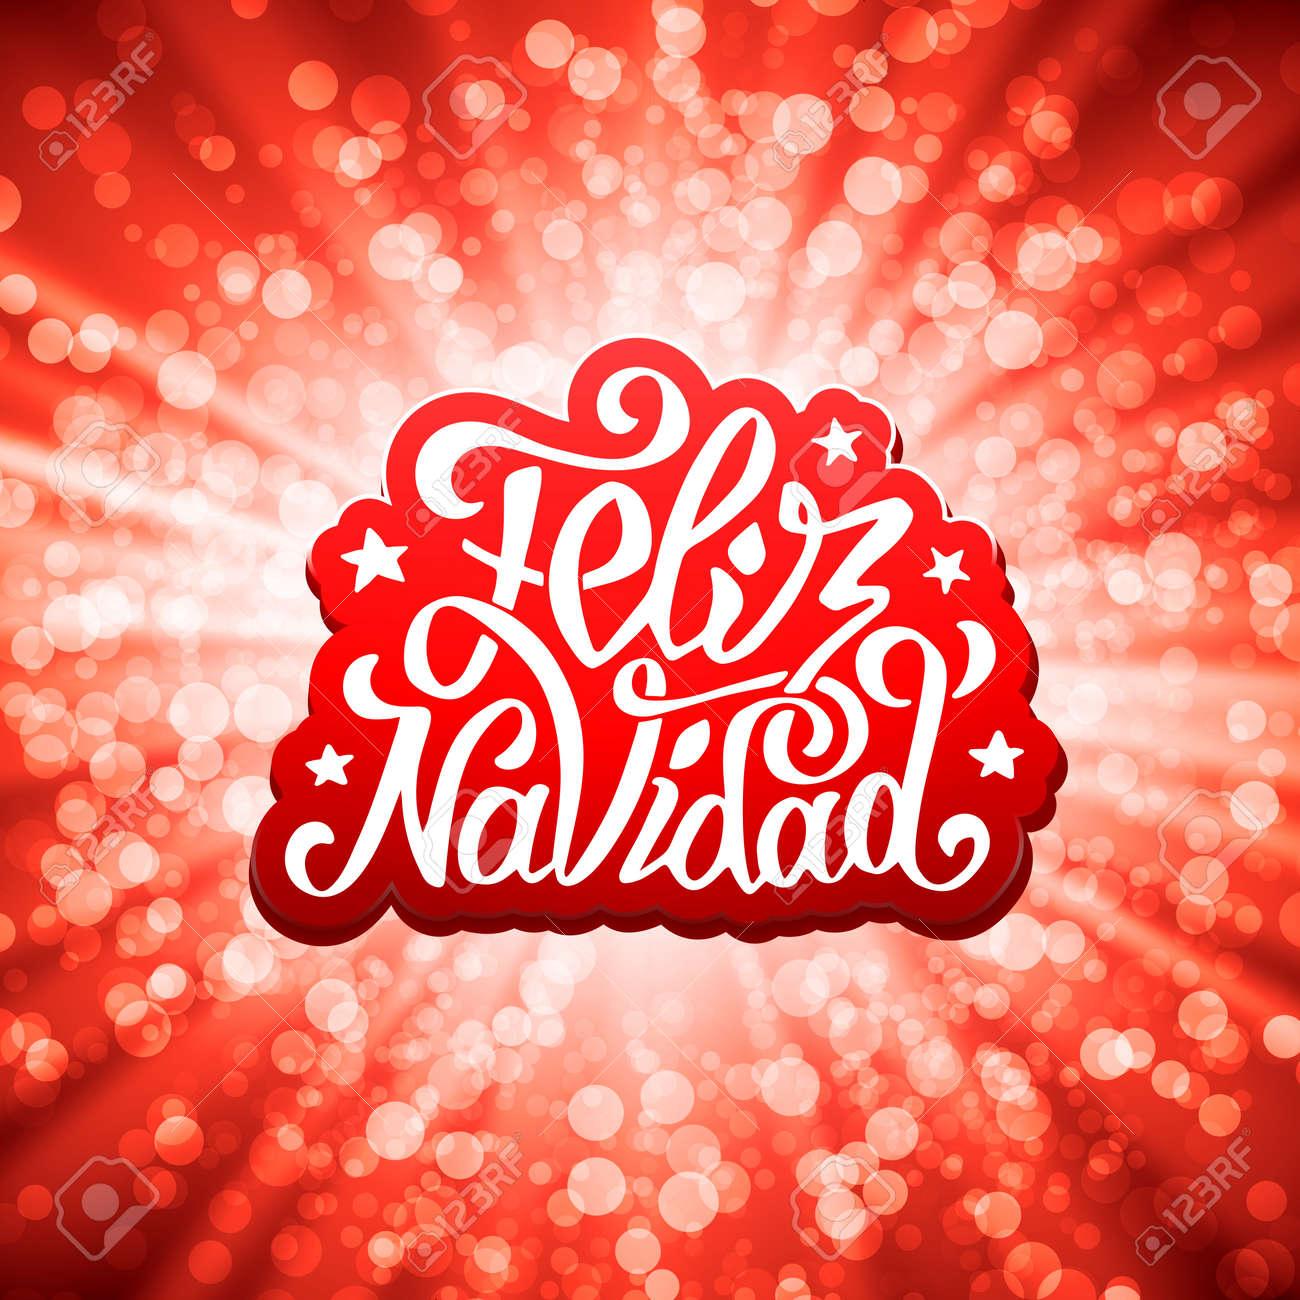 Feliz Navidad Lettering For Invitation Prints And Greeting Cards